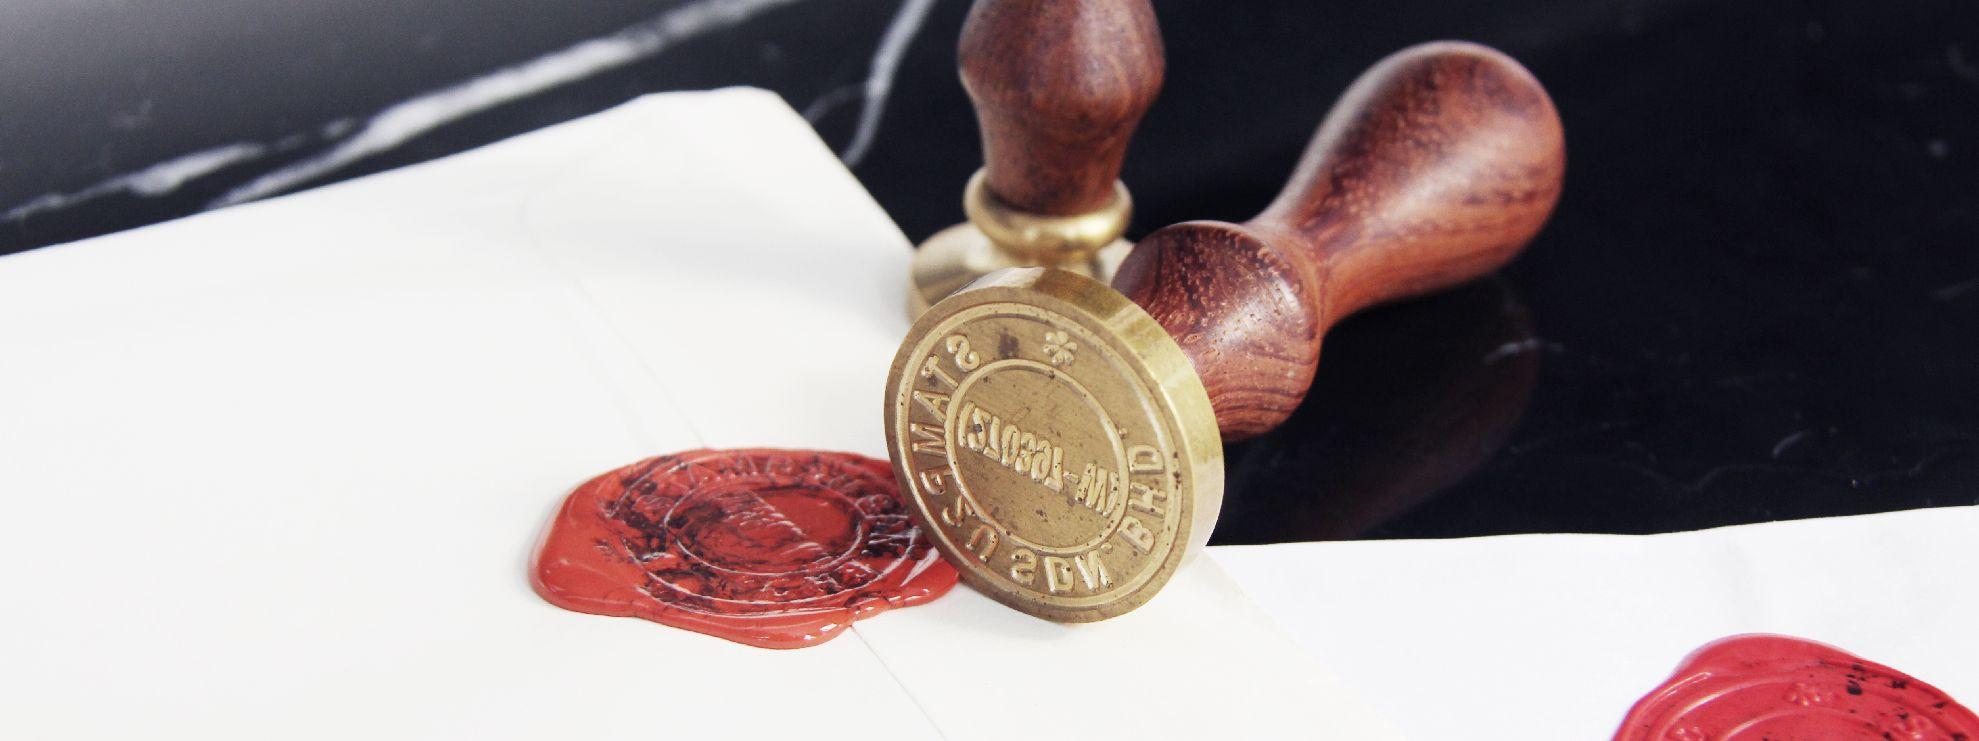 stamp2u_wax_seal_3